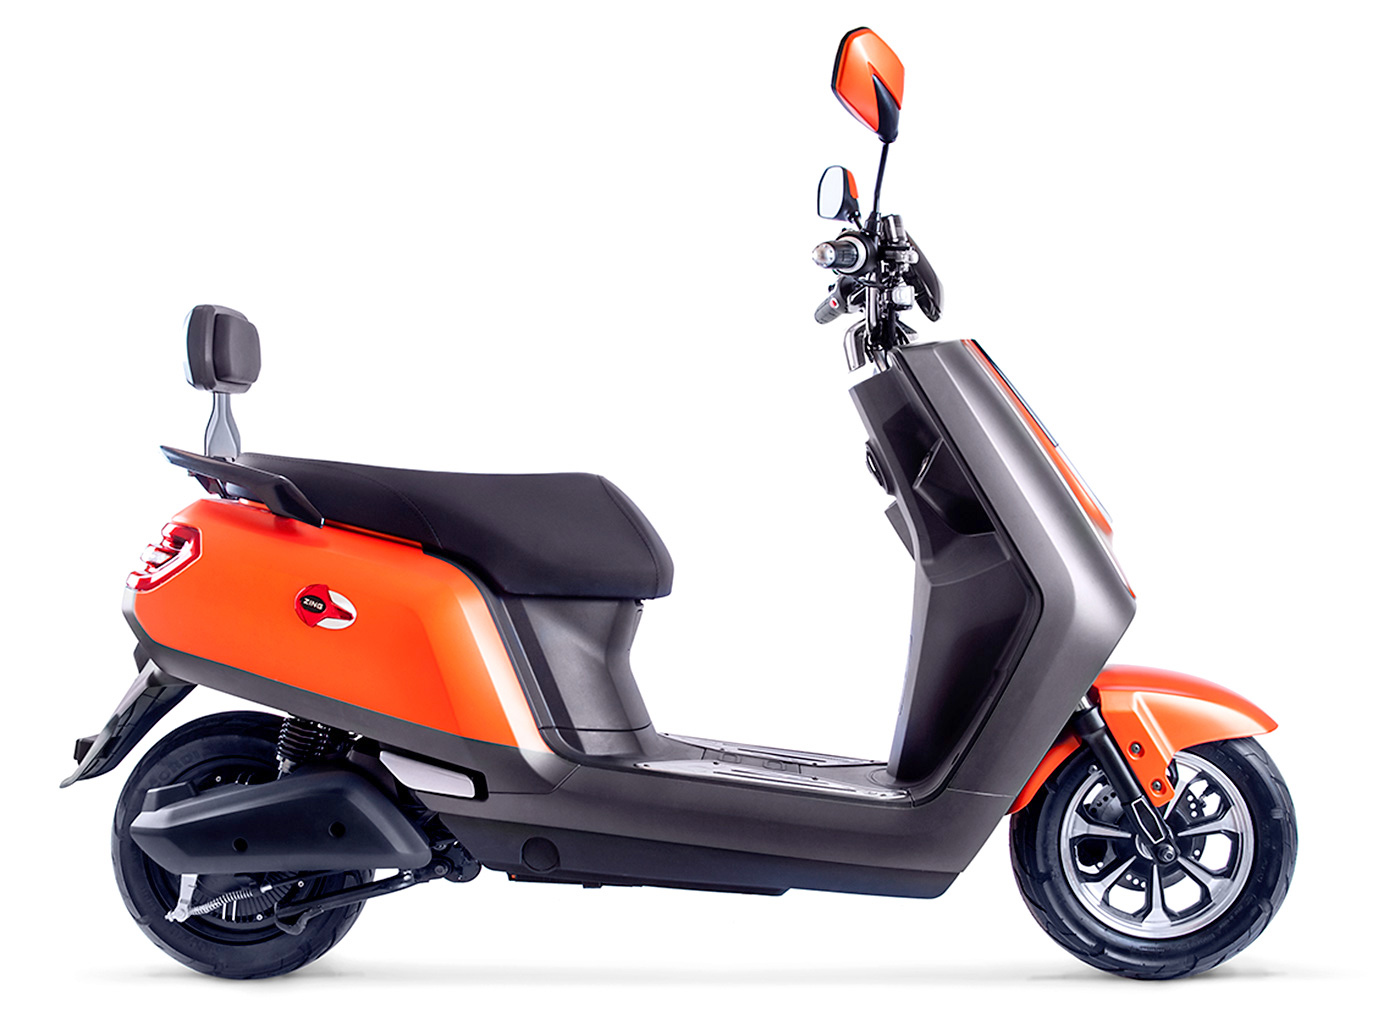 Электроскутер Eltreco ZING WIDE 60V800W Оранжевый 019016-0390